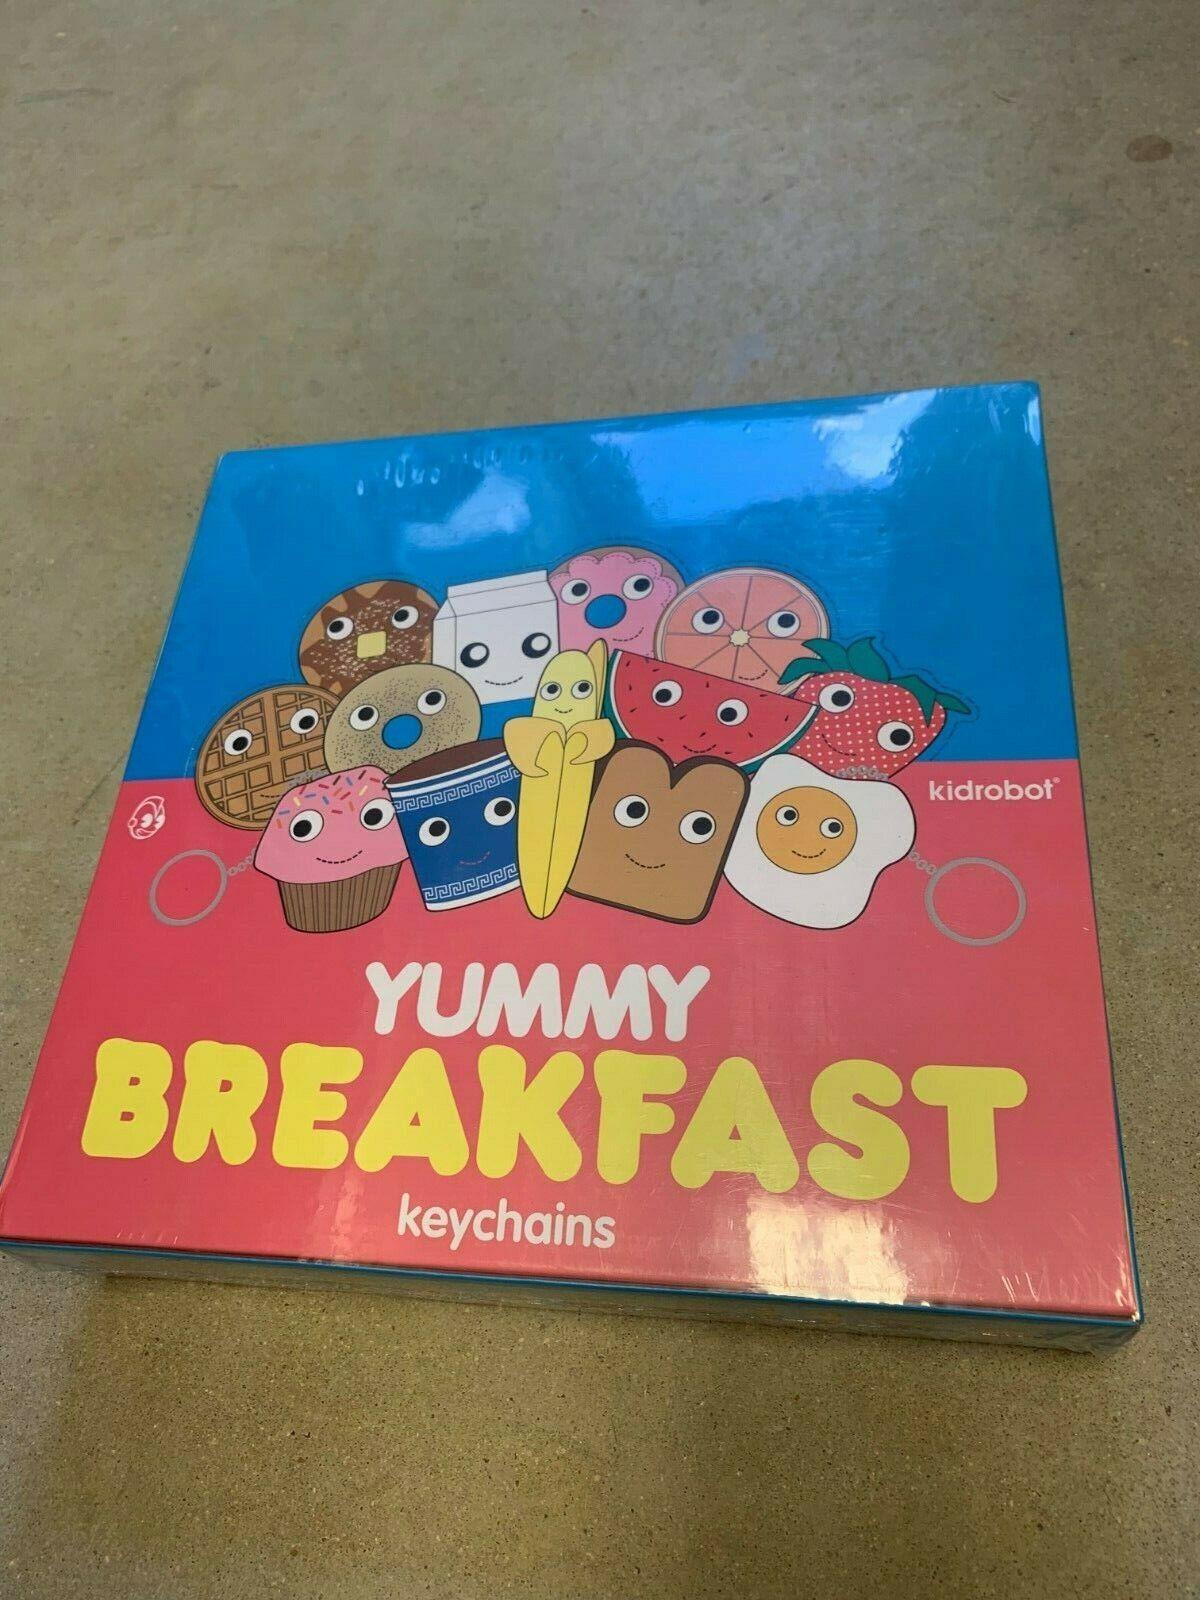 Yummy Breakfast keychain blind box - Kid Robot